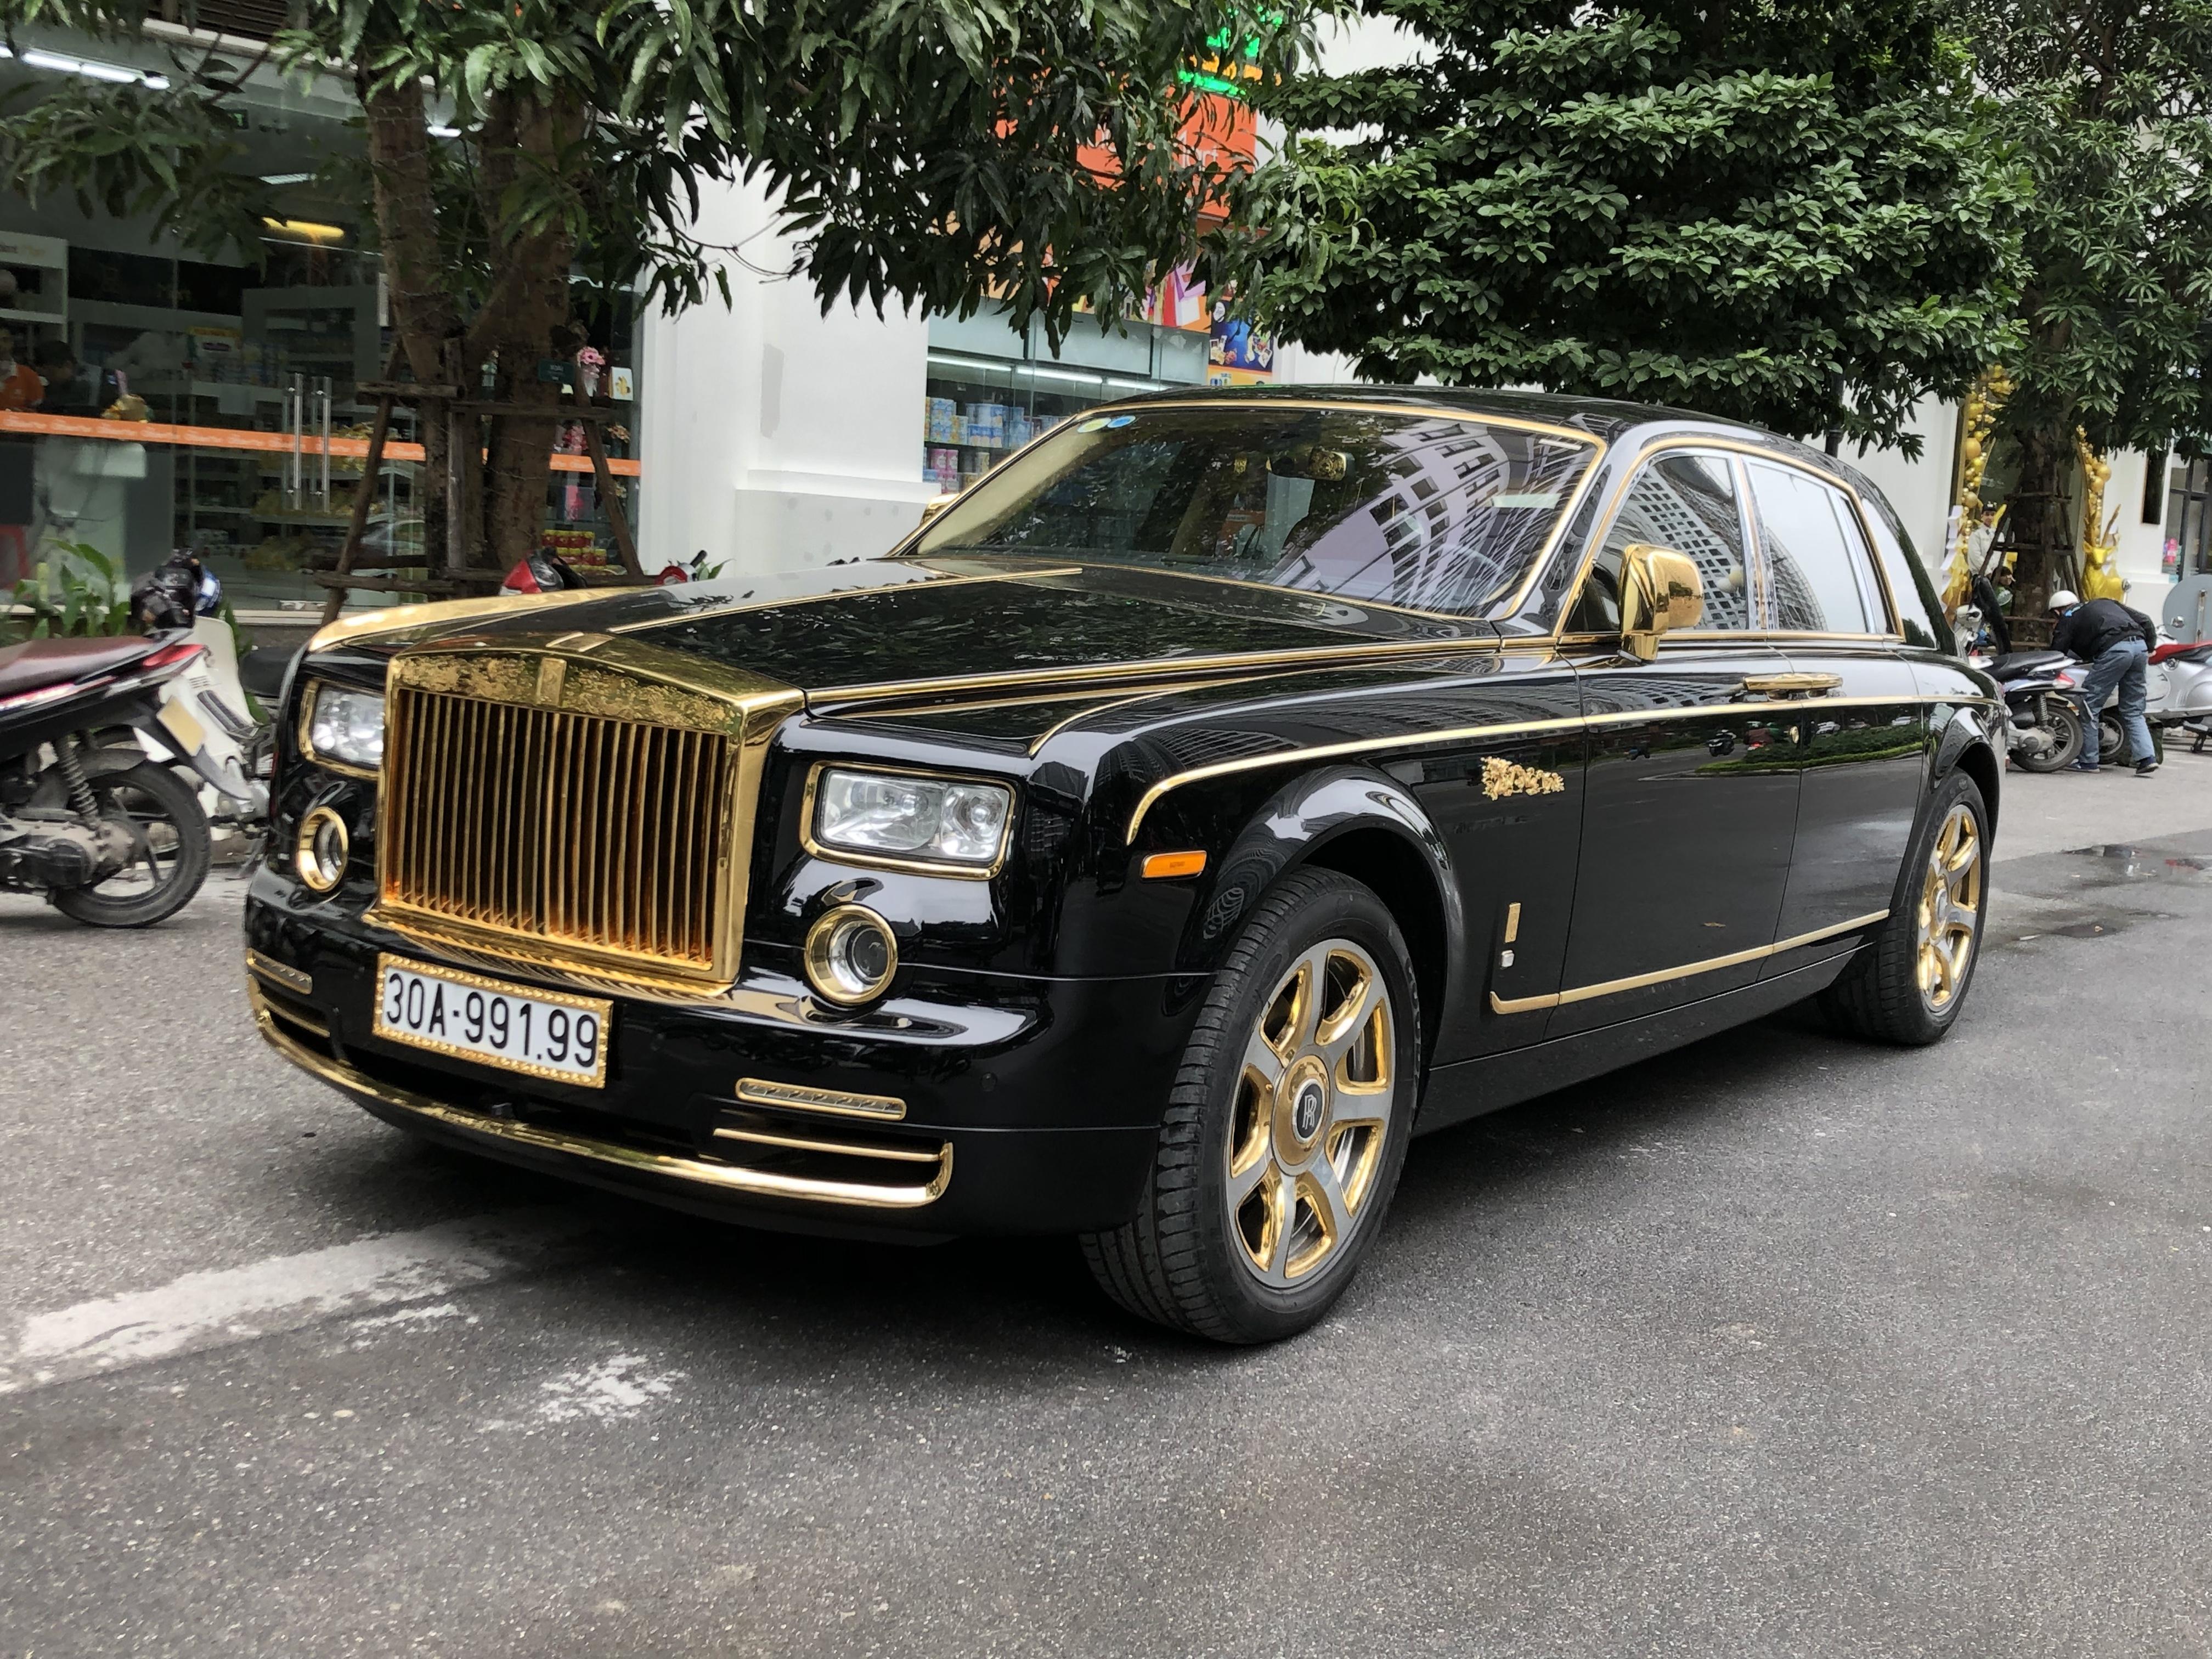 Gold Rolls Royce >> File Newone Gold Dragon Rolls Royce Phantom At Times City